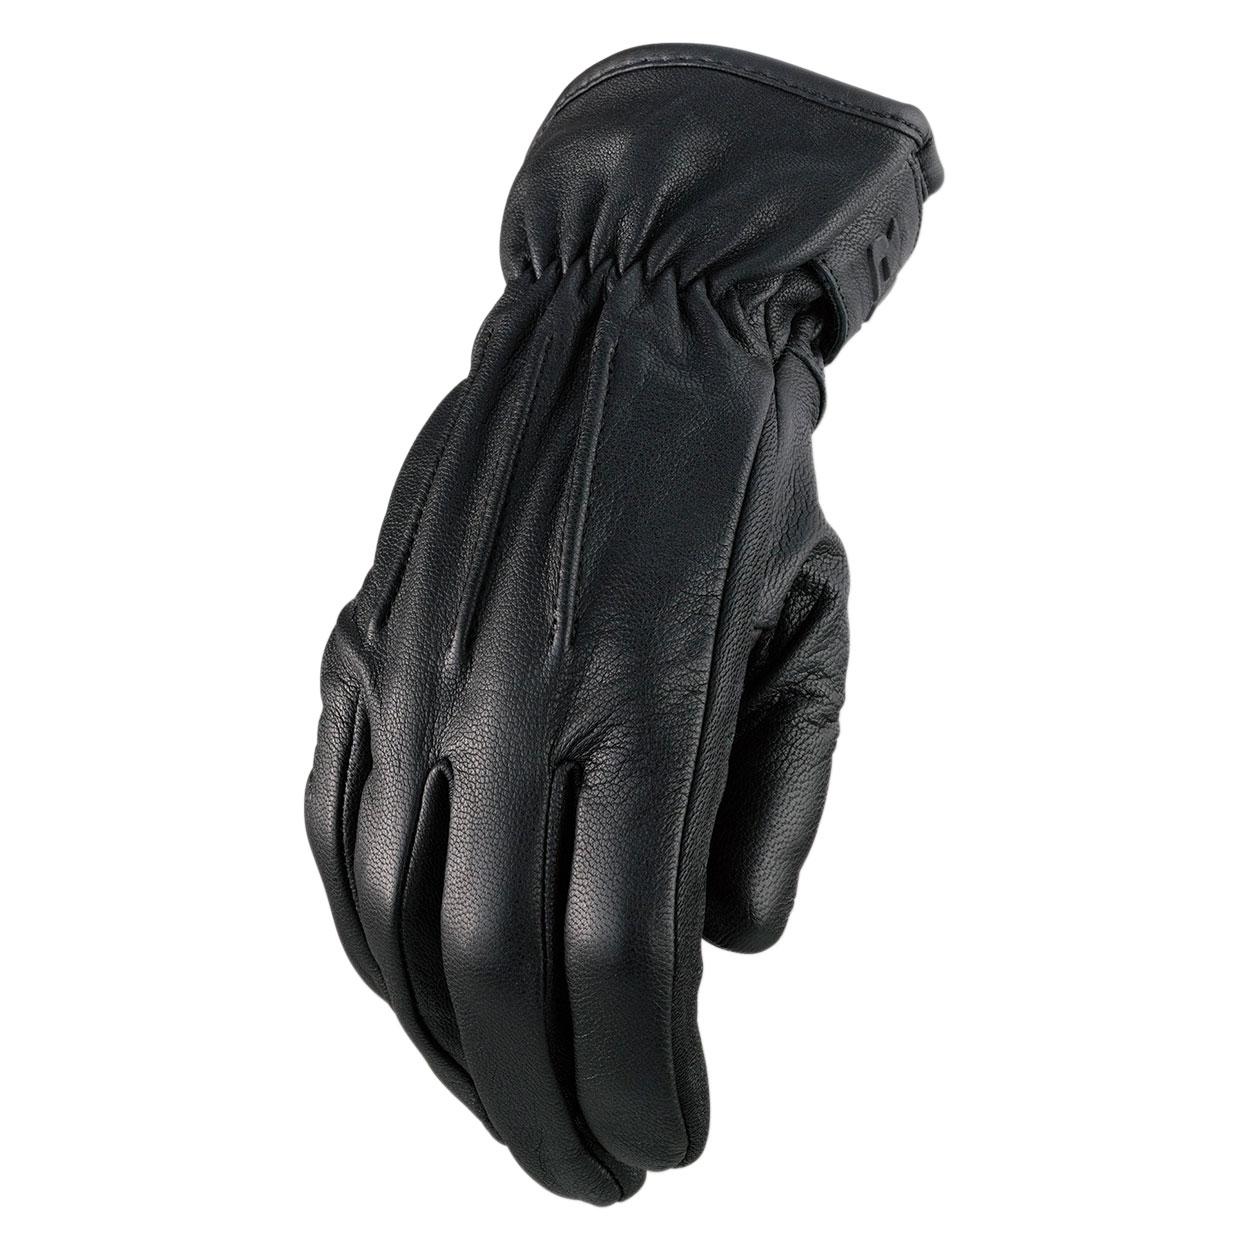 Z1R Men's Reaper II Black Leather Gloves